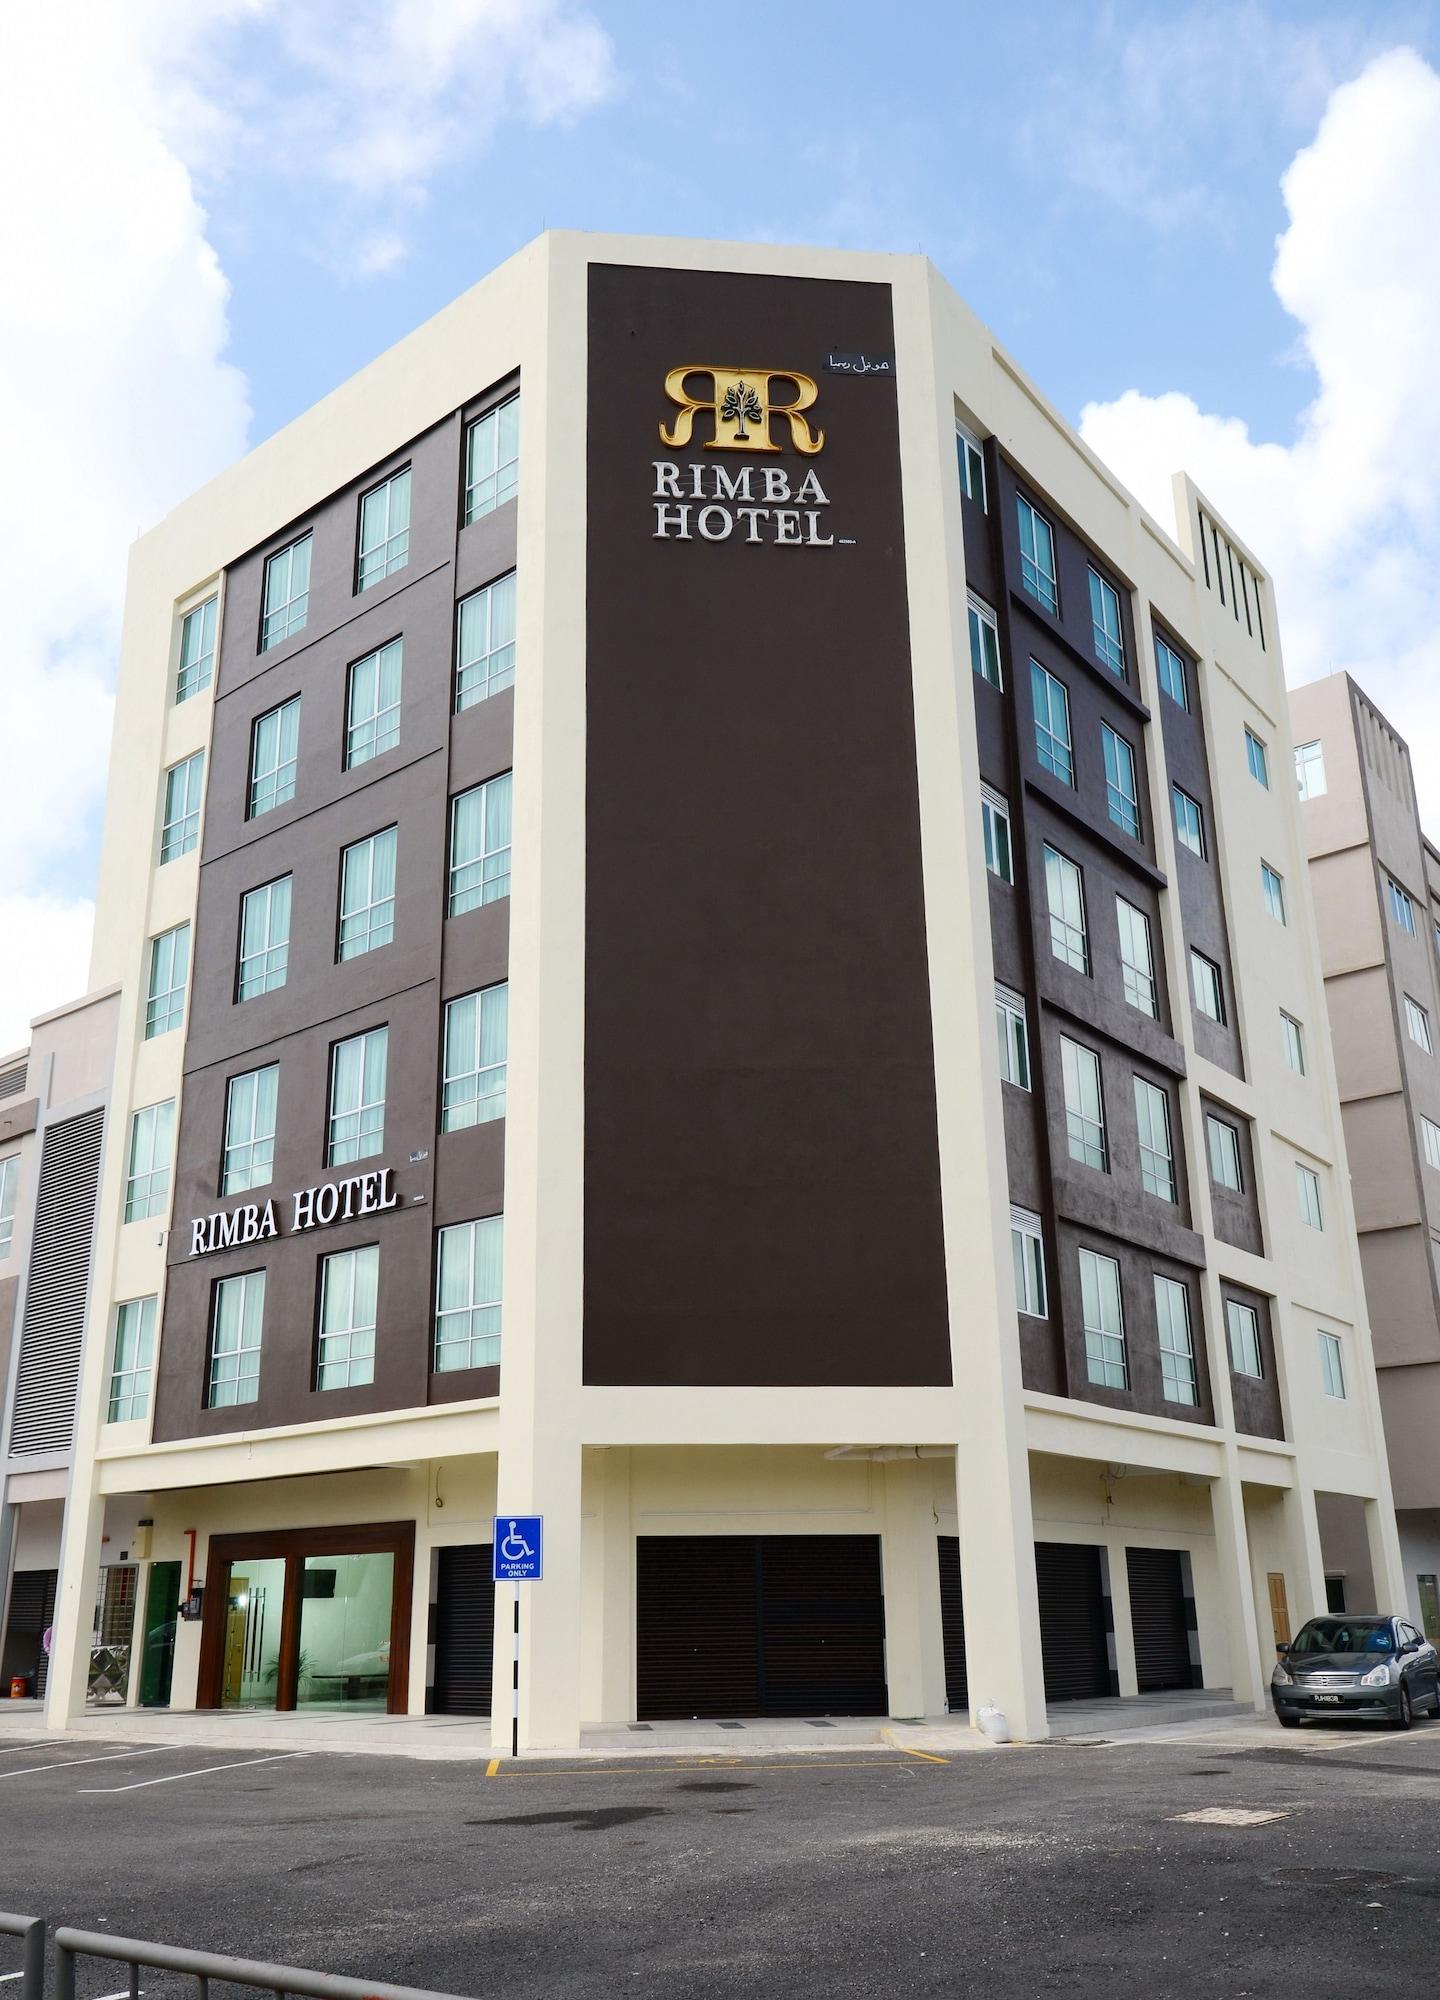 Rimba Hotel, Kuala Terengganu